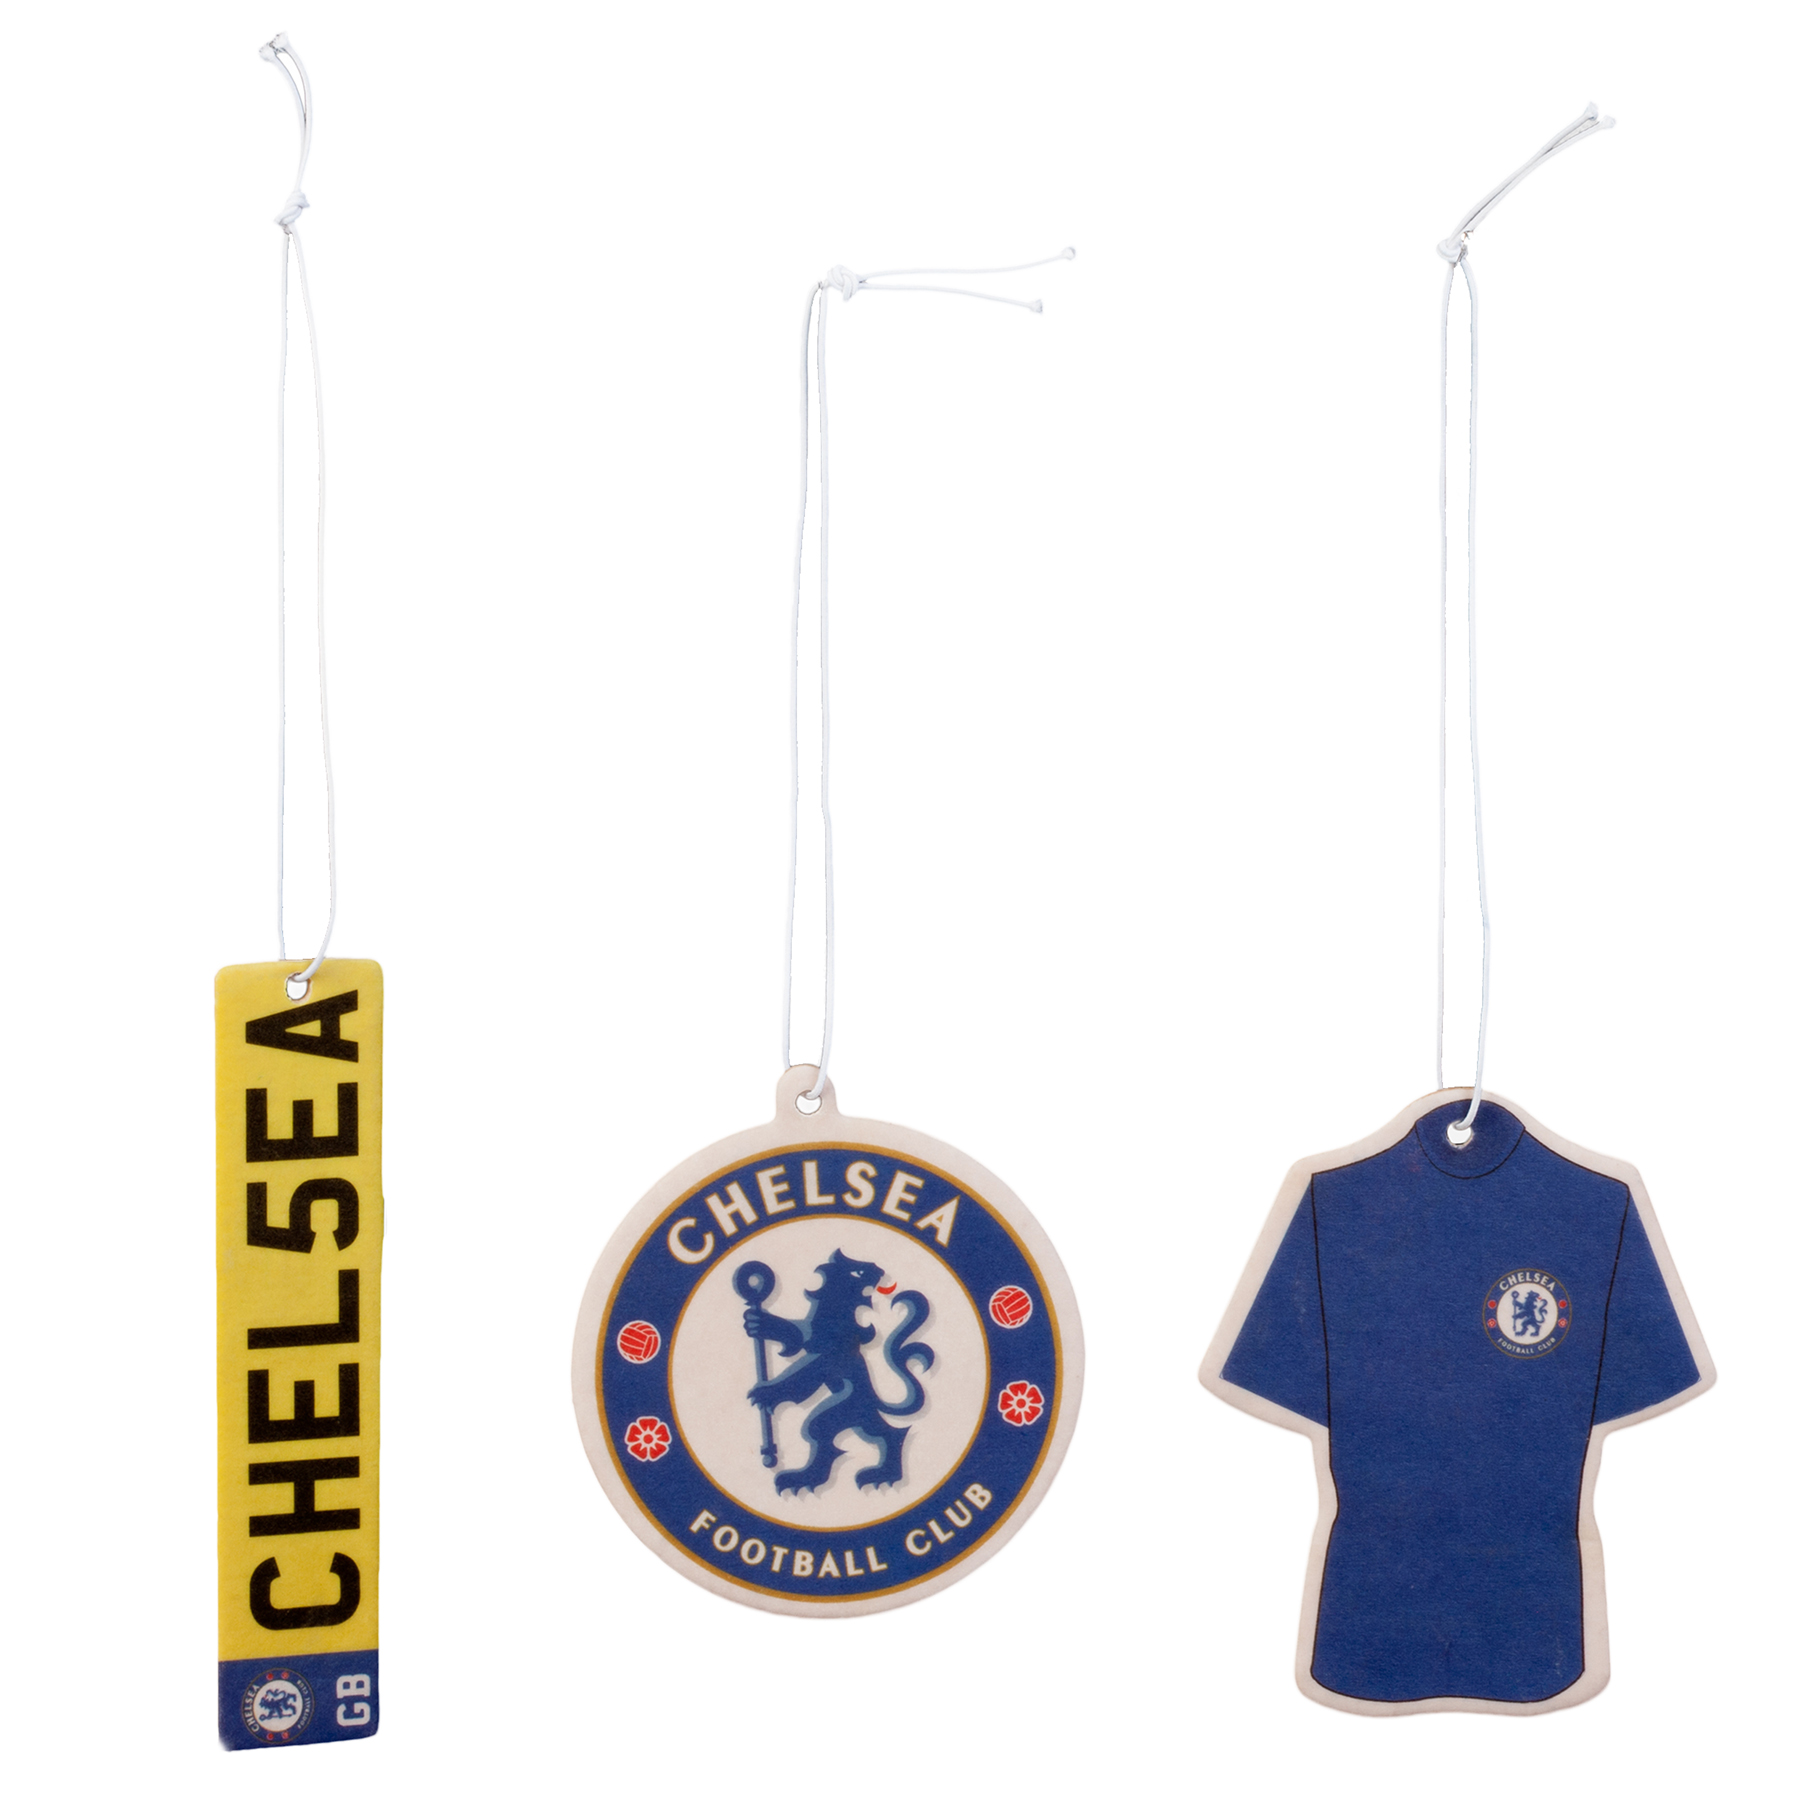 Chelsea Car Air Freshener - 3 Pack